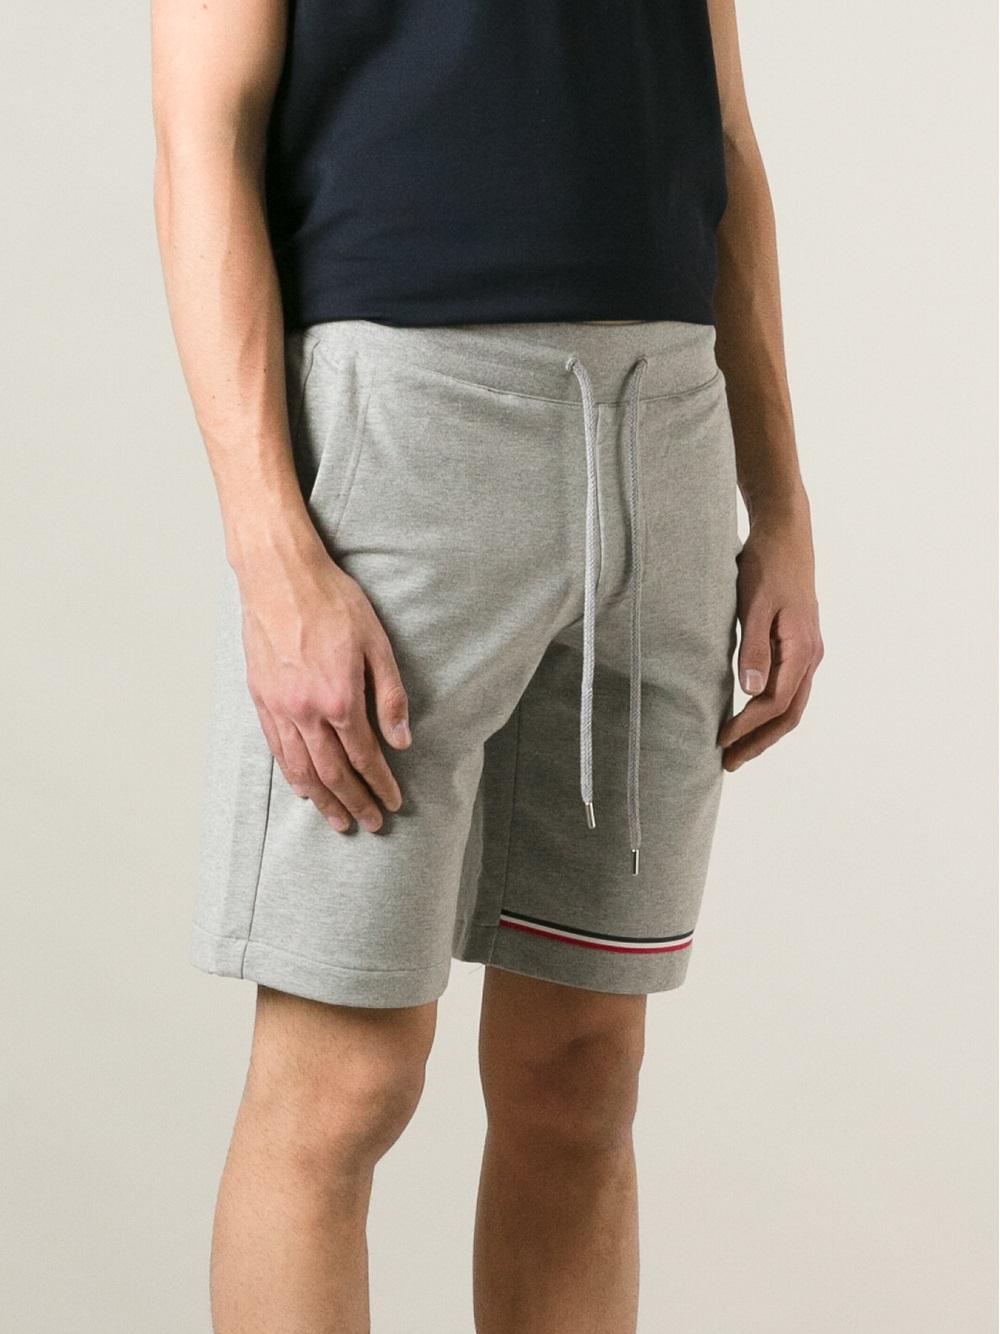 d68dc4aa300a Moncler Sweatshorts in Gray for Men - Lyst